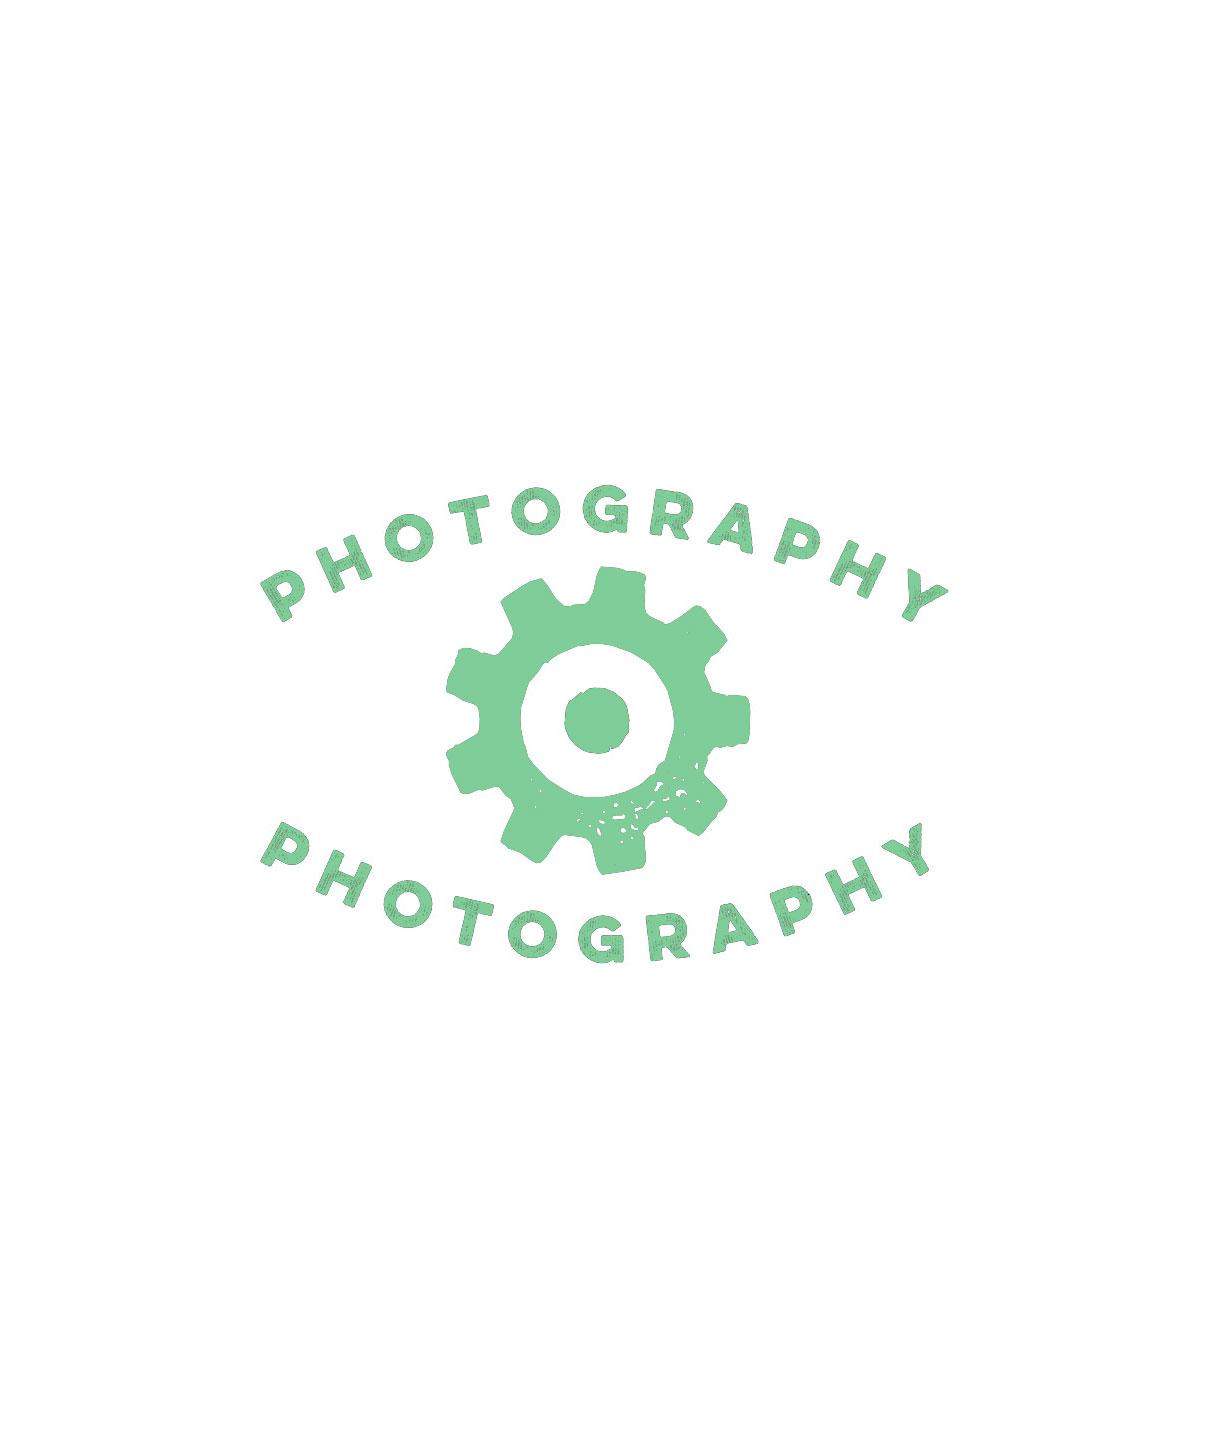 photography-type-treatment-green-OP.jpg